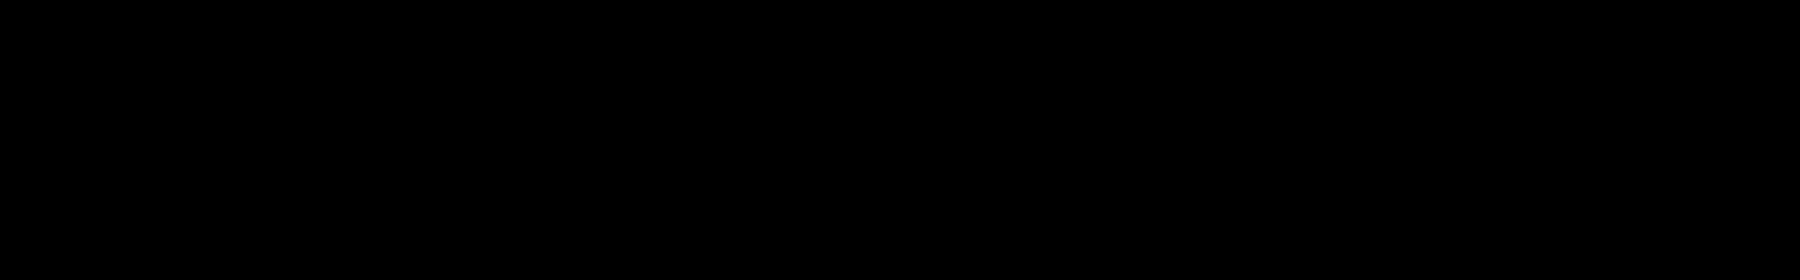 Flare audio waveform